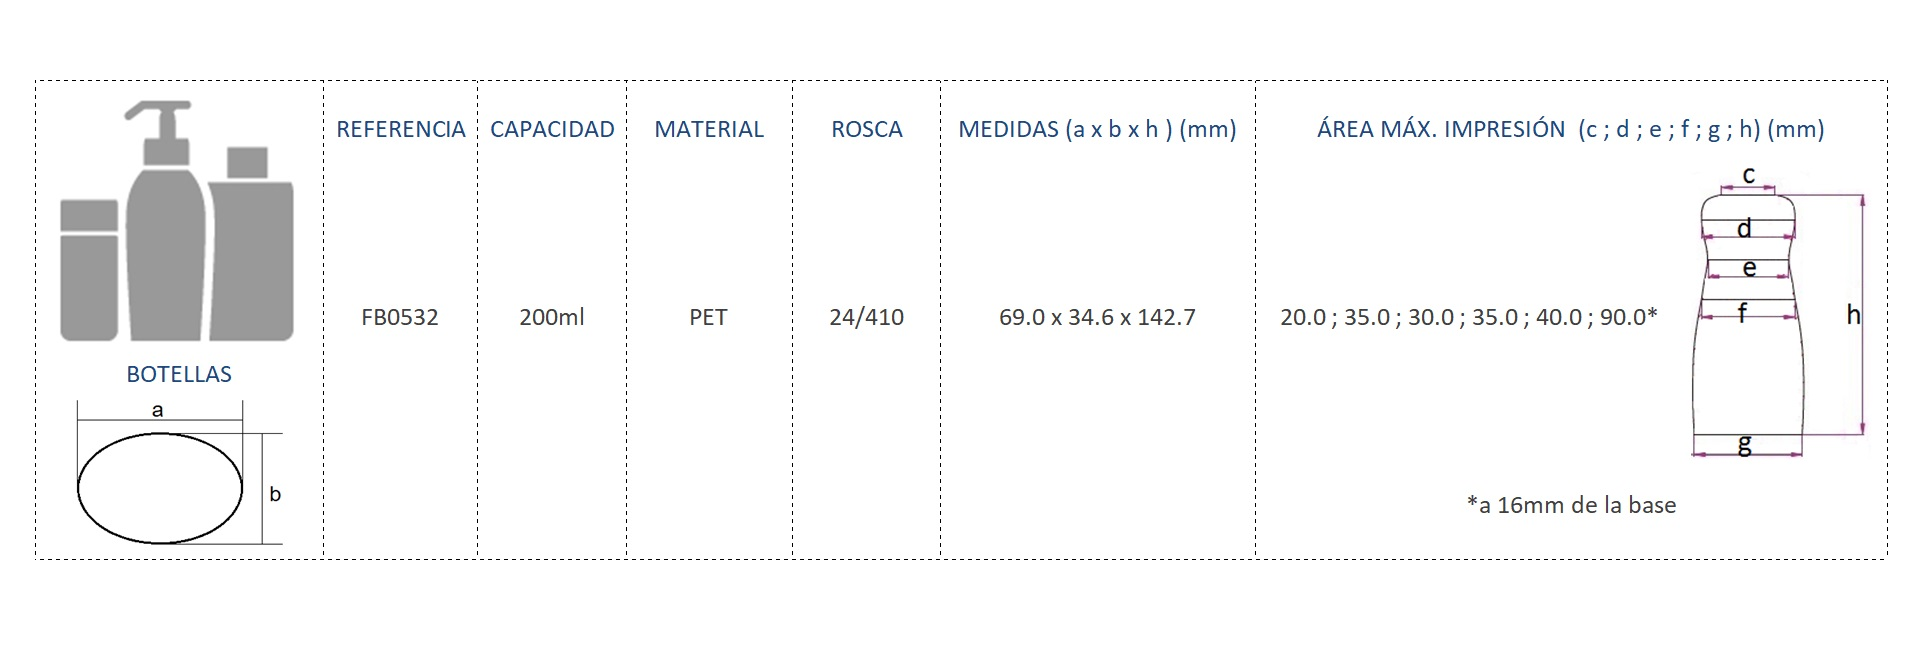 Cuadro de materiales botella FB0532